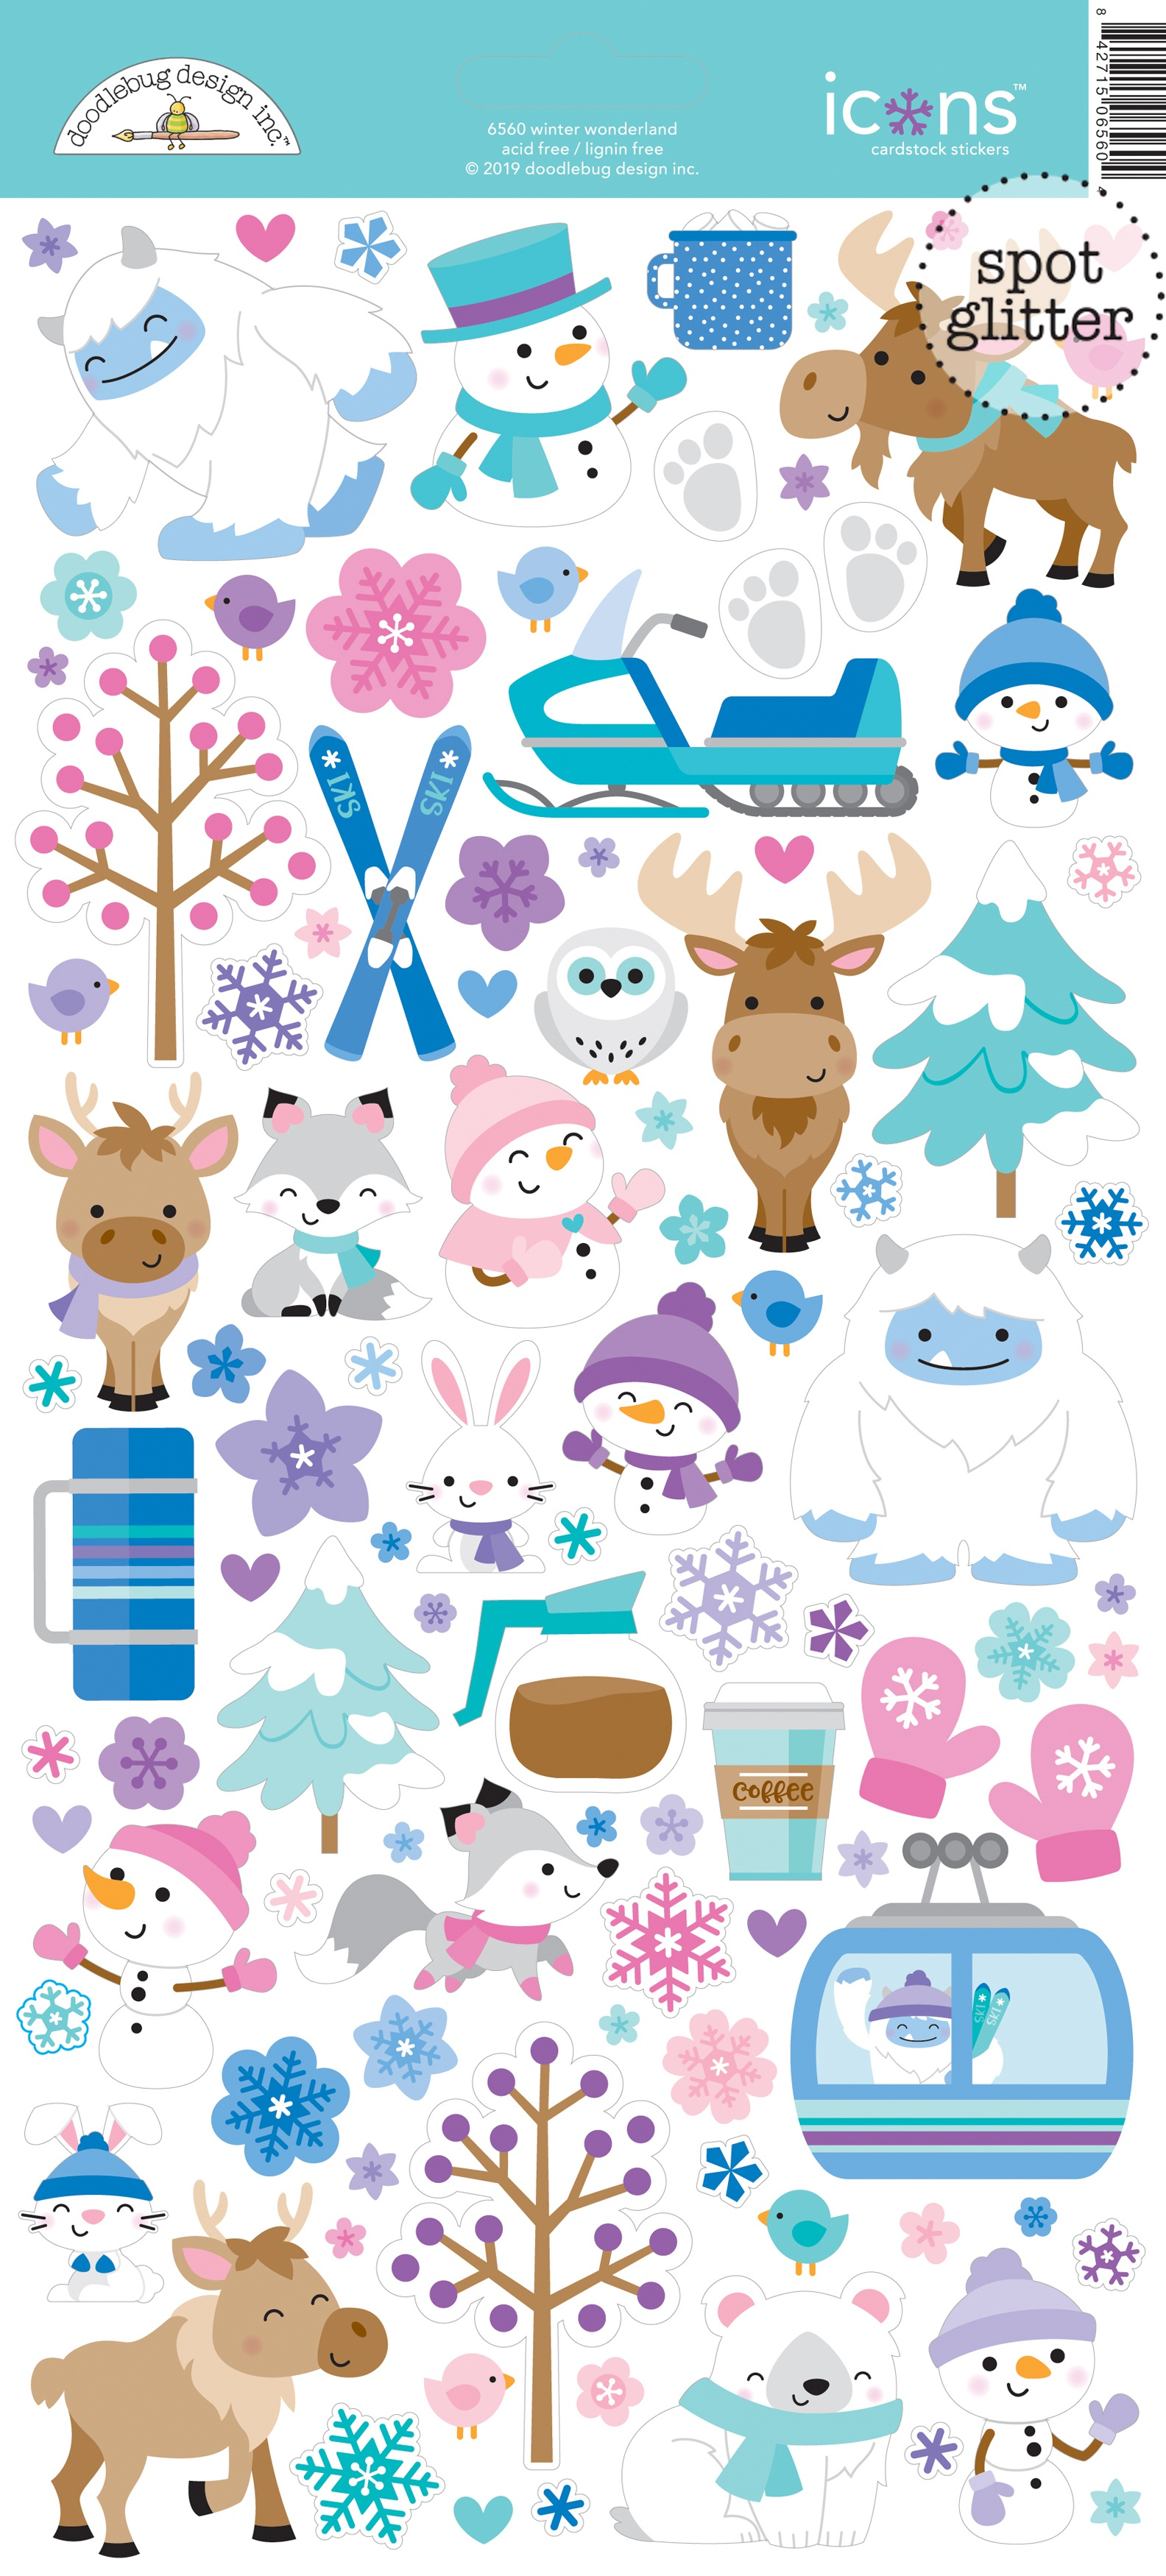 Doodlebug Winter Wonderland - Icons Cardstock Stickers